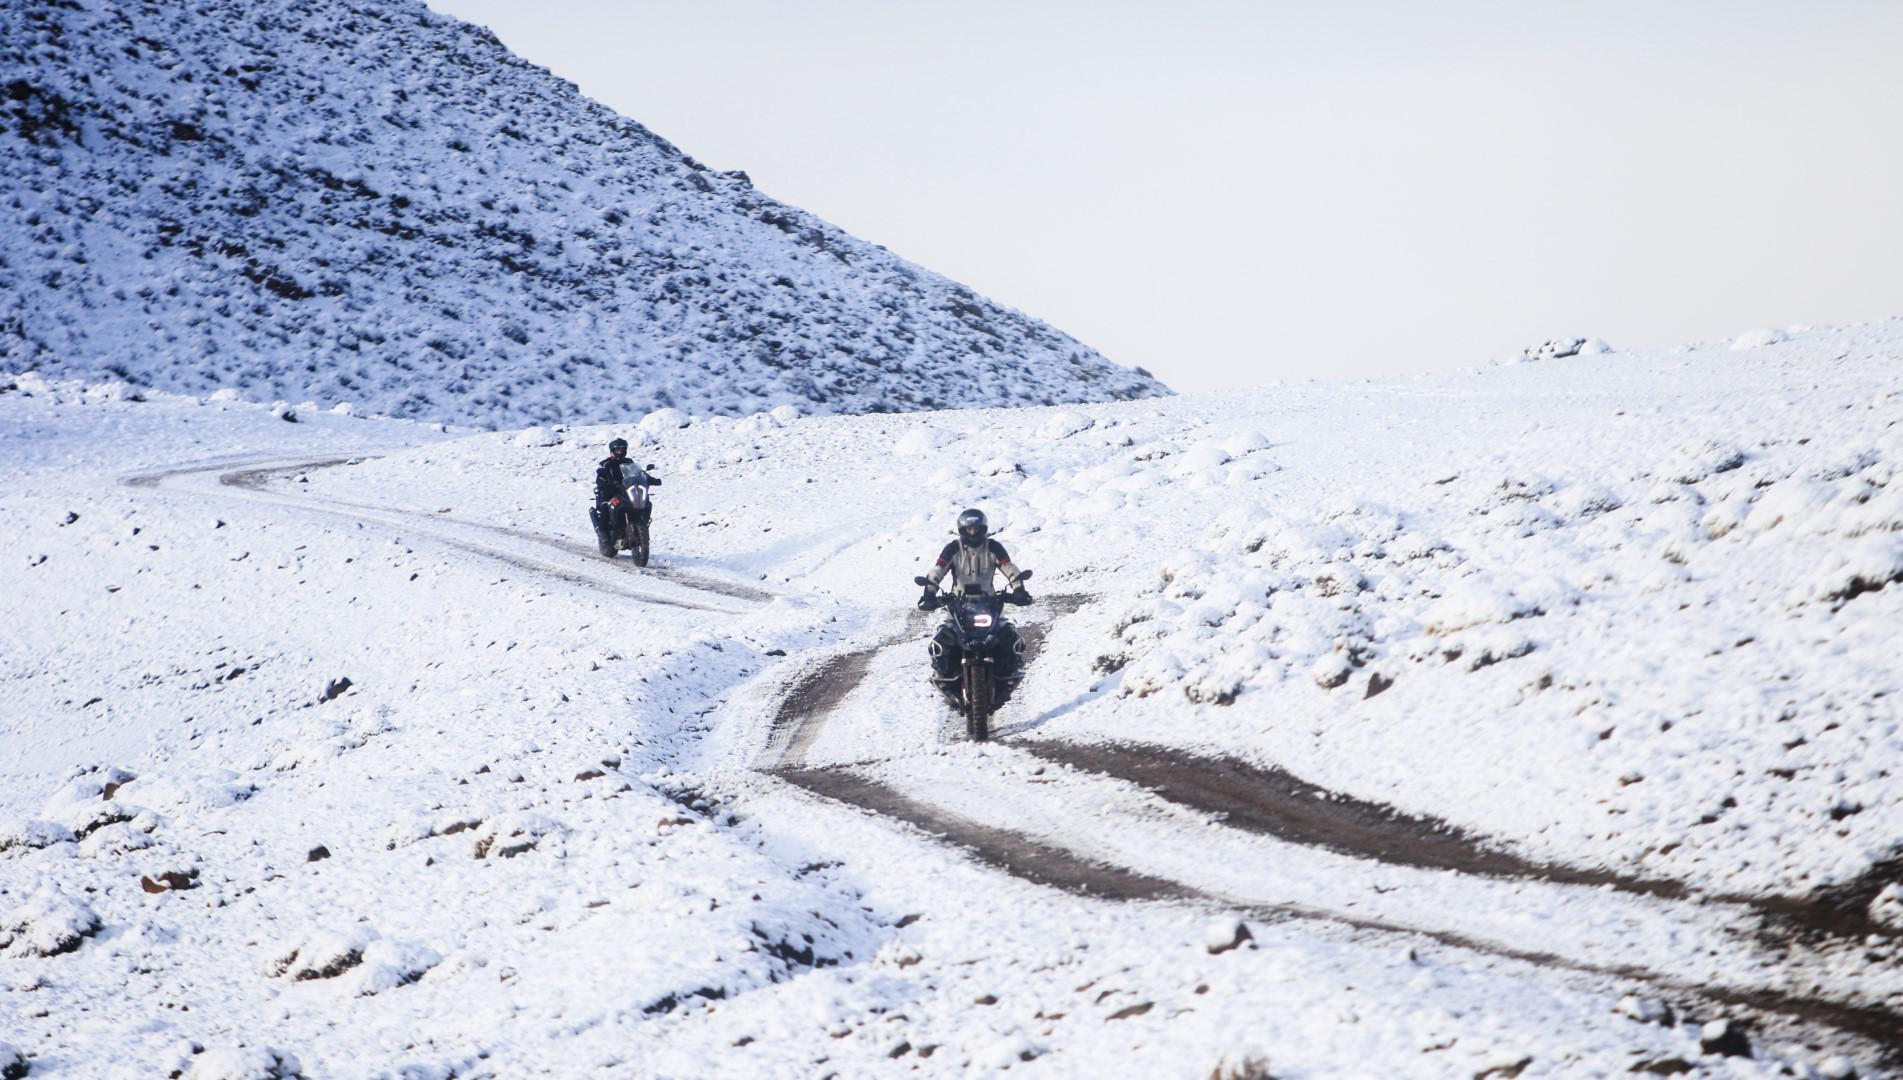 le-morocco-tizi-challenge-est-en-piste-1257-1.jpg